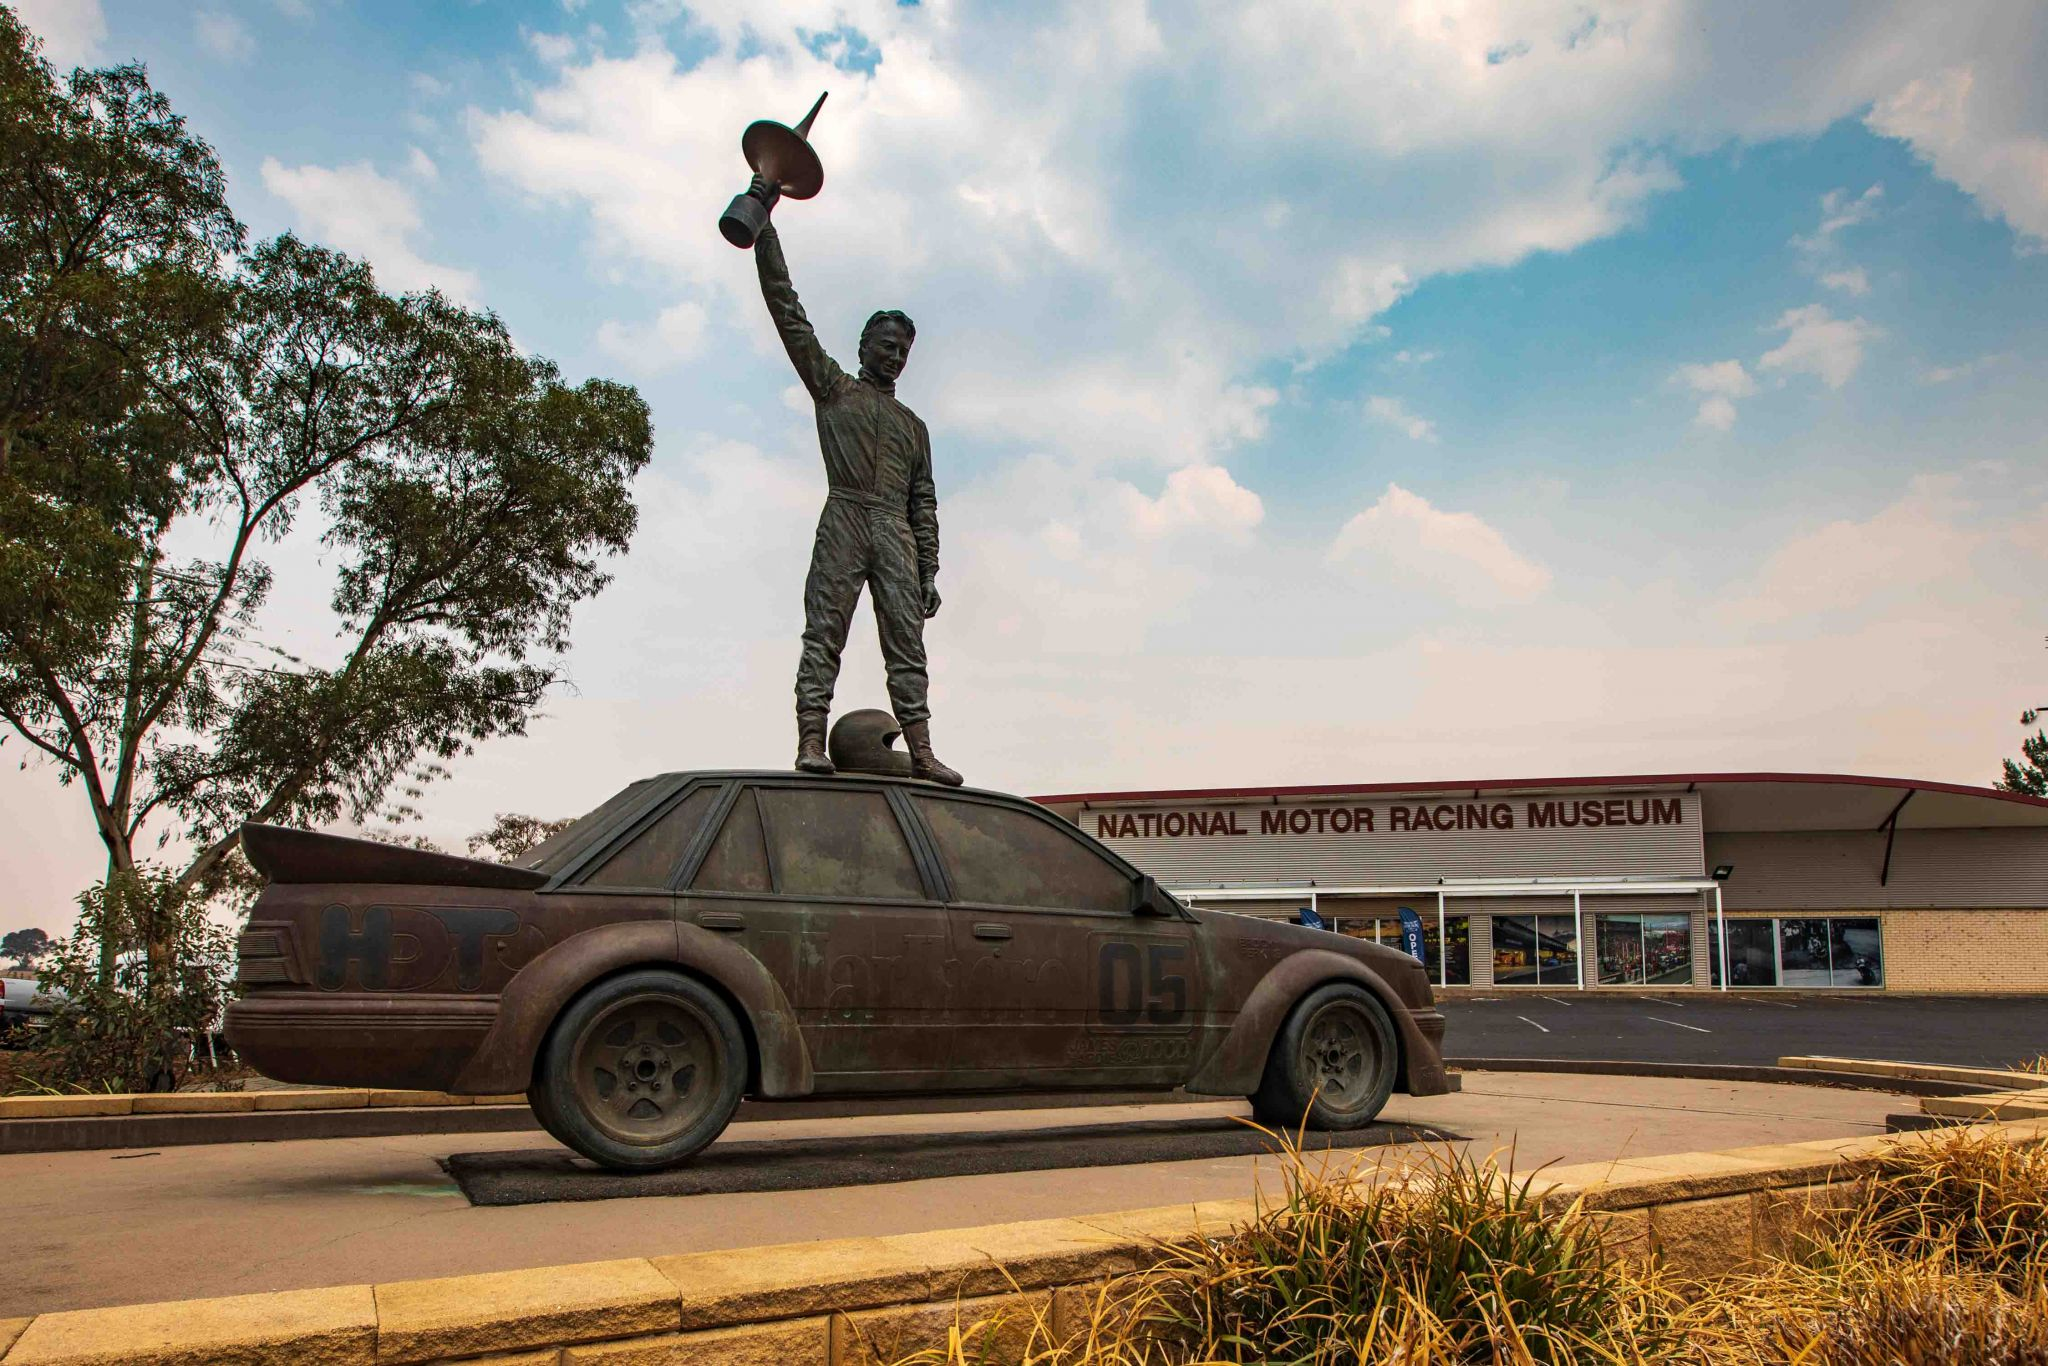 National Motor Racing Museum, Mt Panorama, Bathurst NSW, Australia